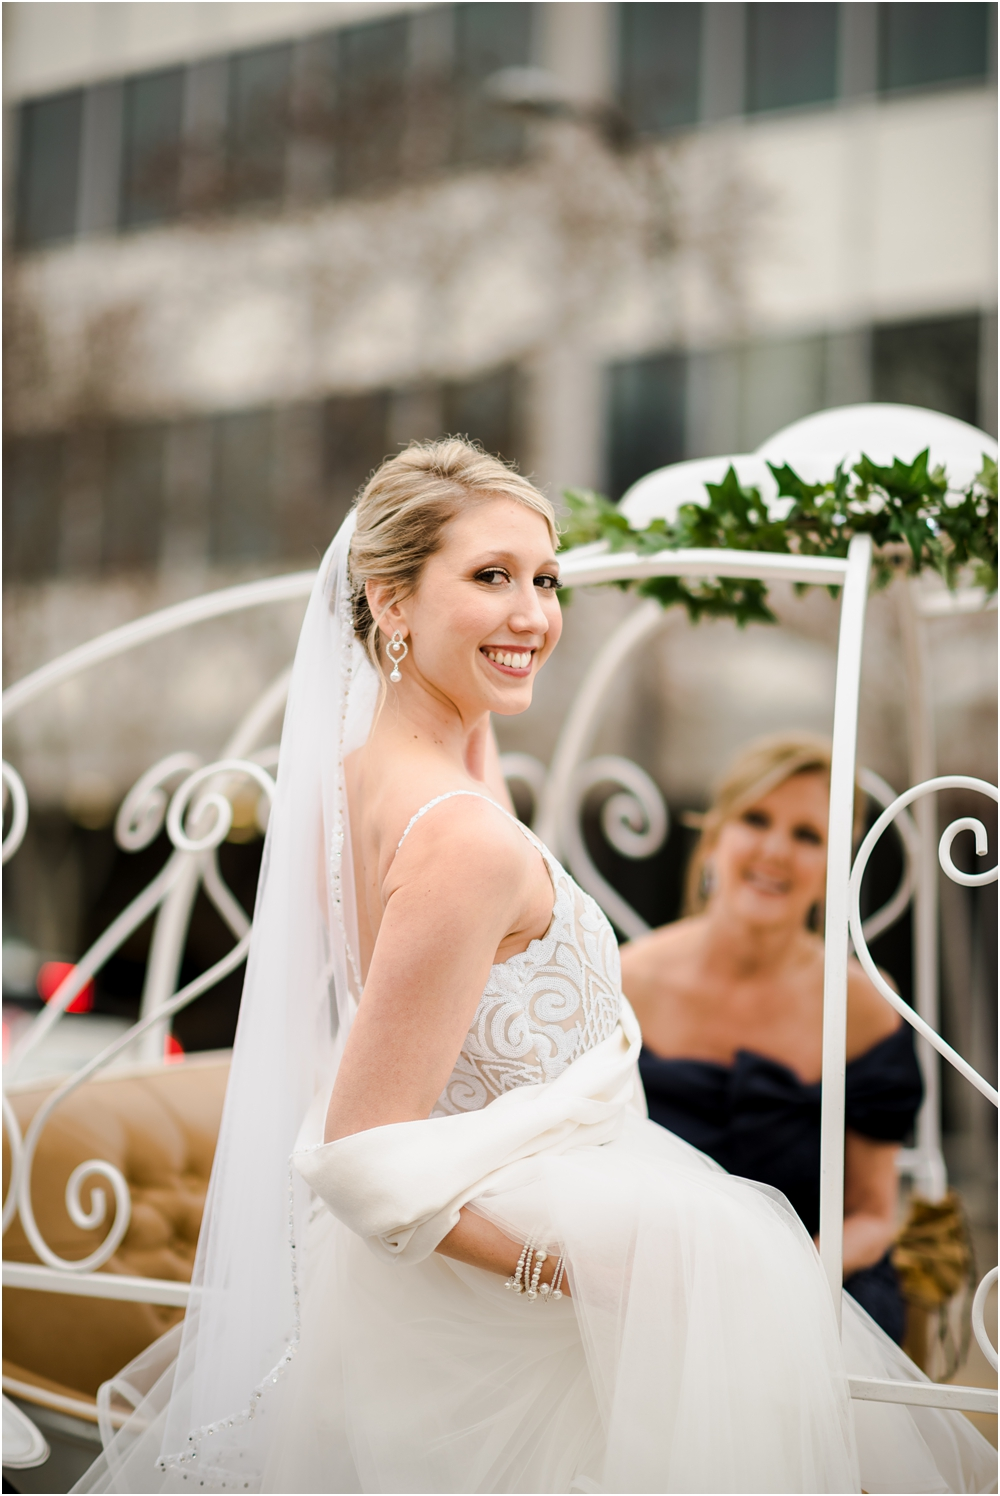 oconnor-pensacola-florida-wedding-photographer-kiersten-taylor-37.jpg